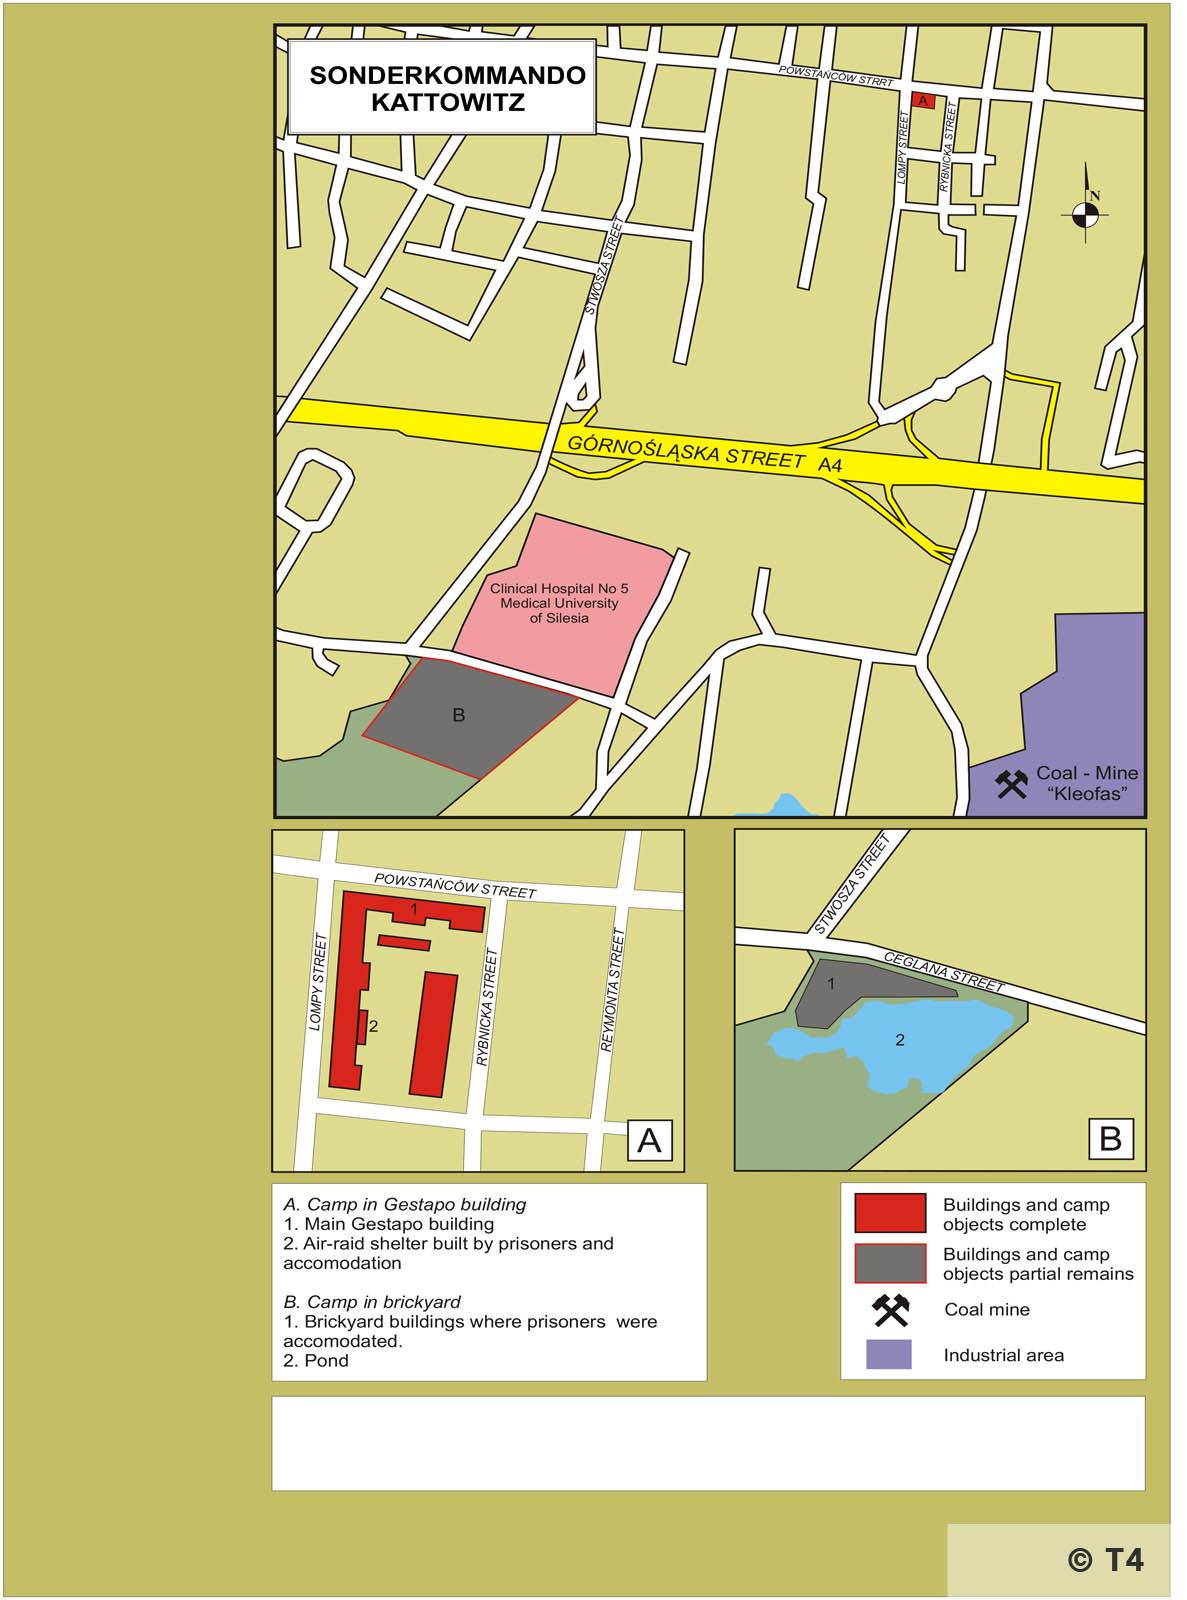 Map of Sonderkommando Kattowitz sub camp. T4